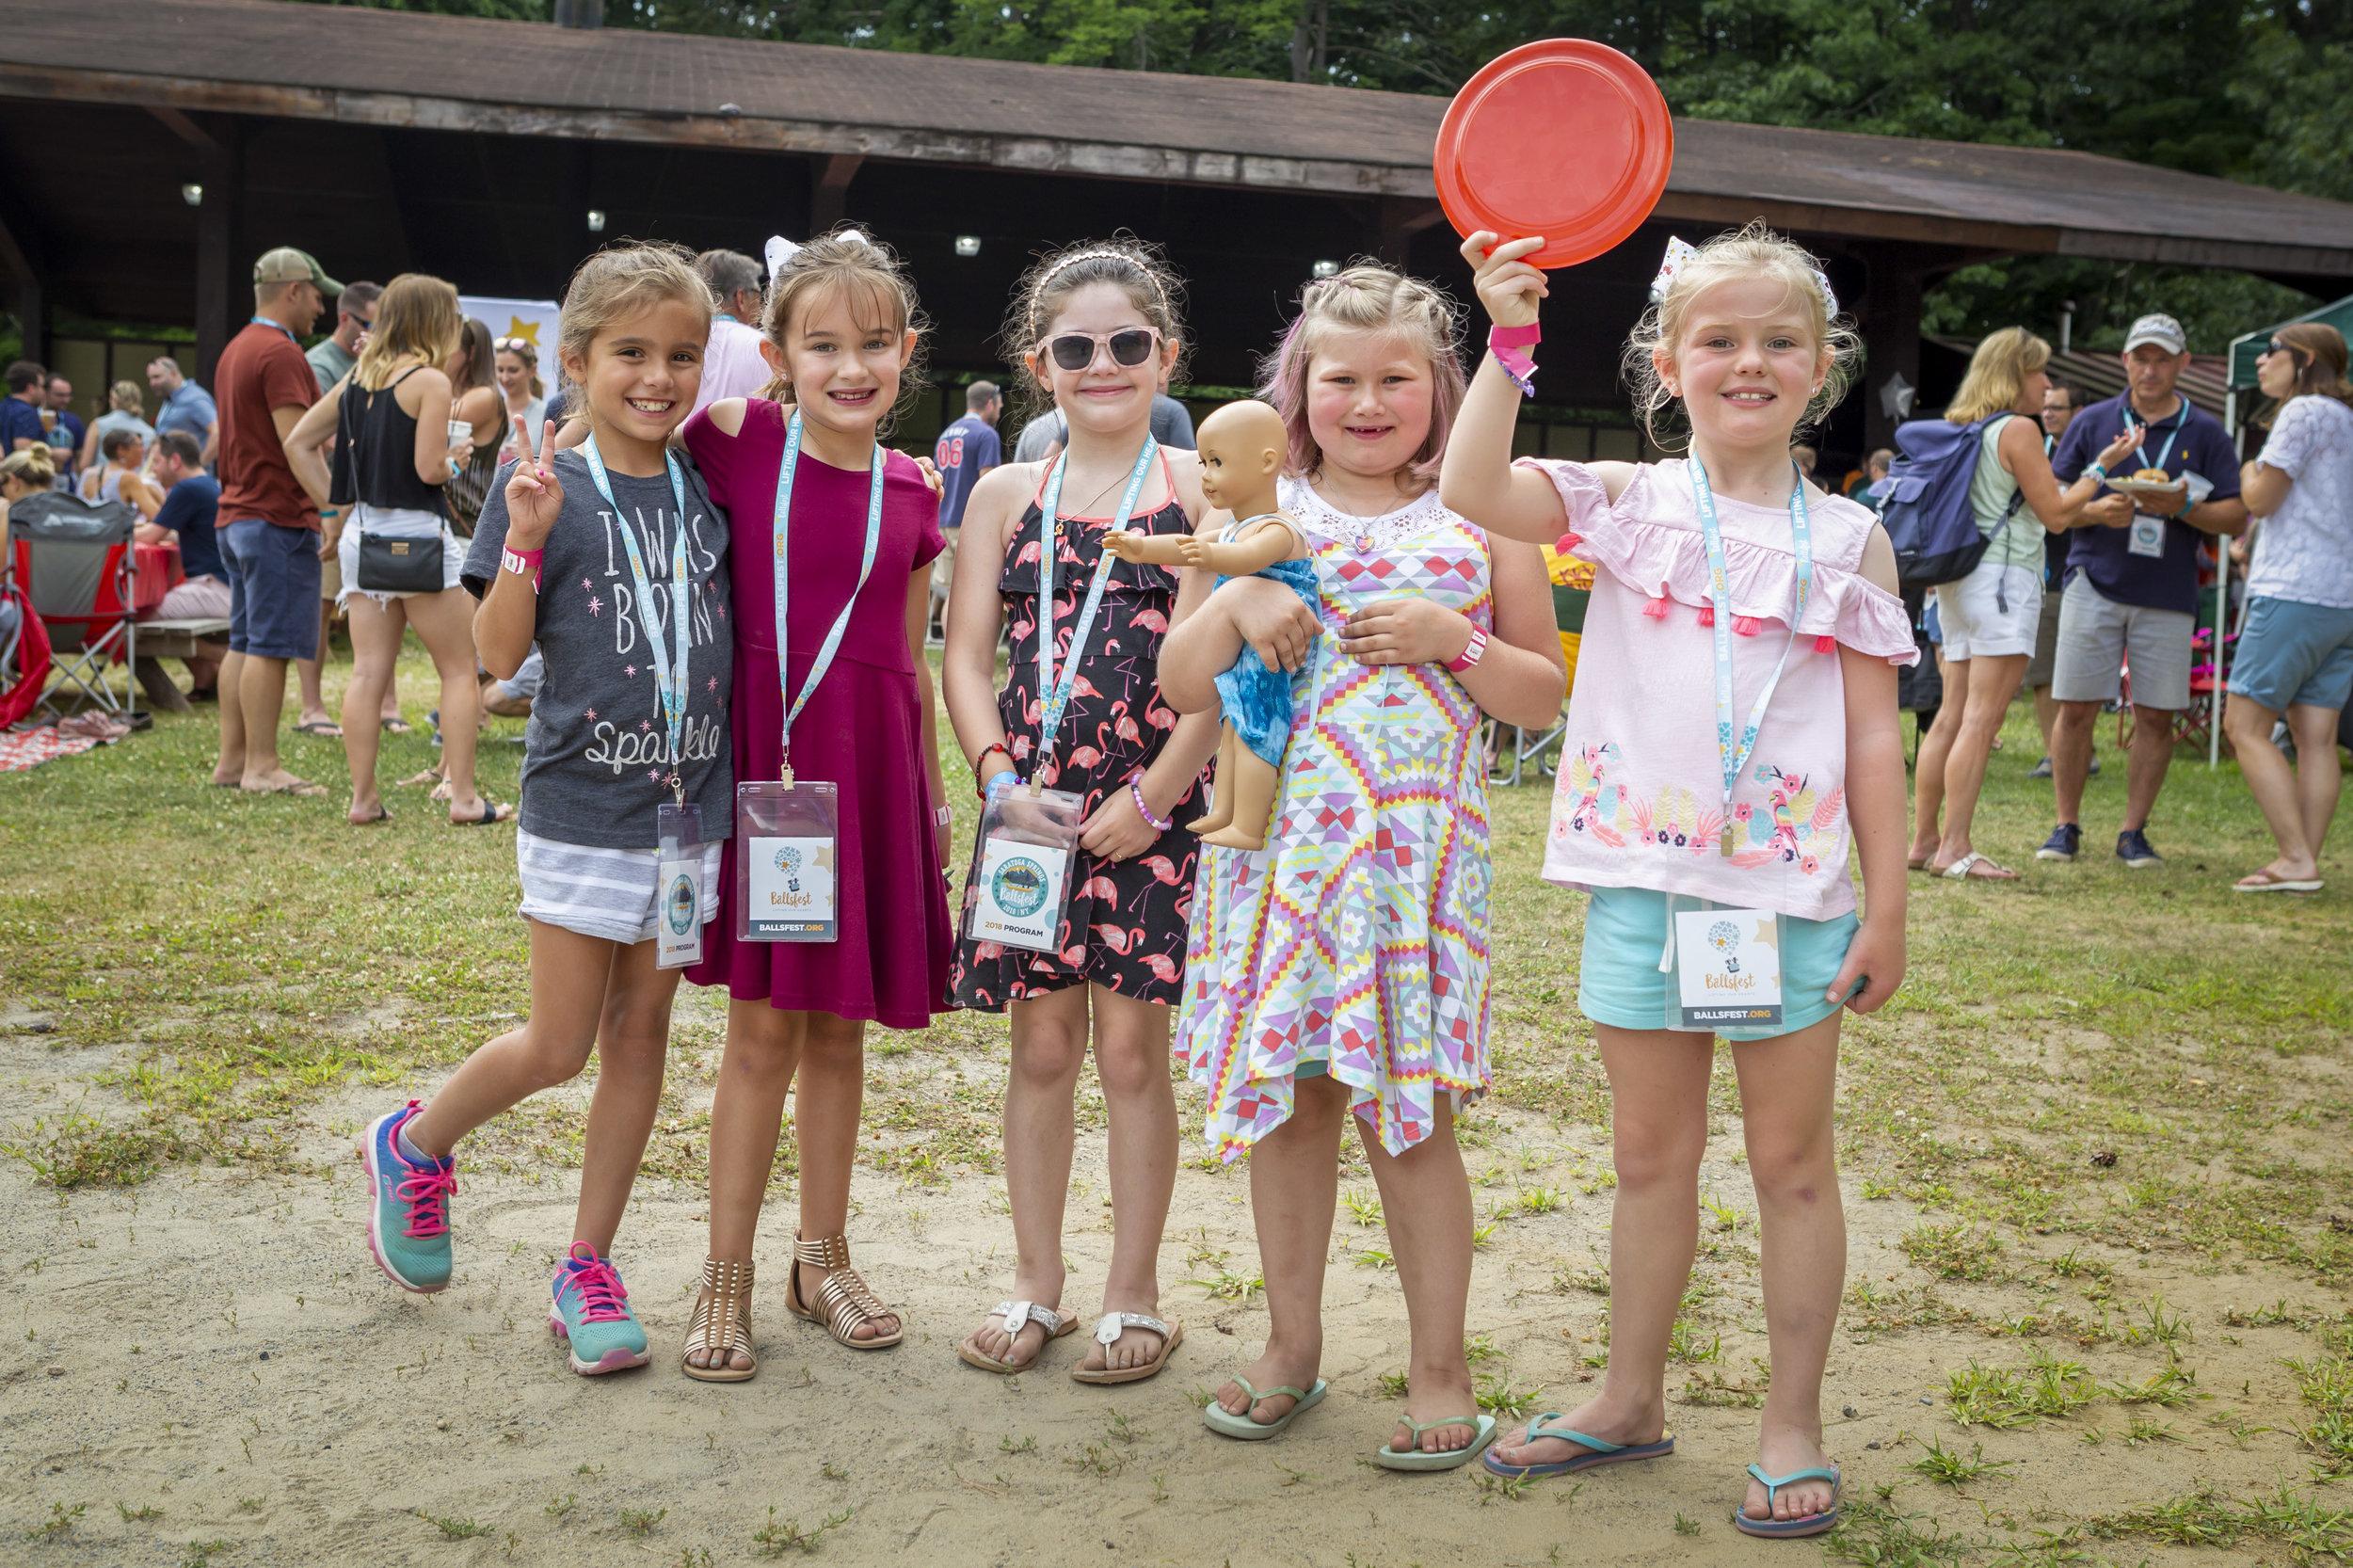 (2018.07.14) Ballsfest Saratoga Spa State Park-.jpg